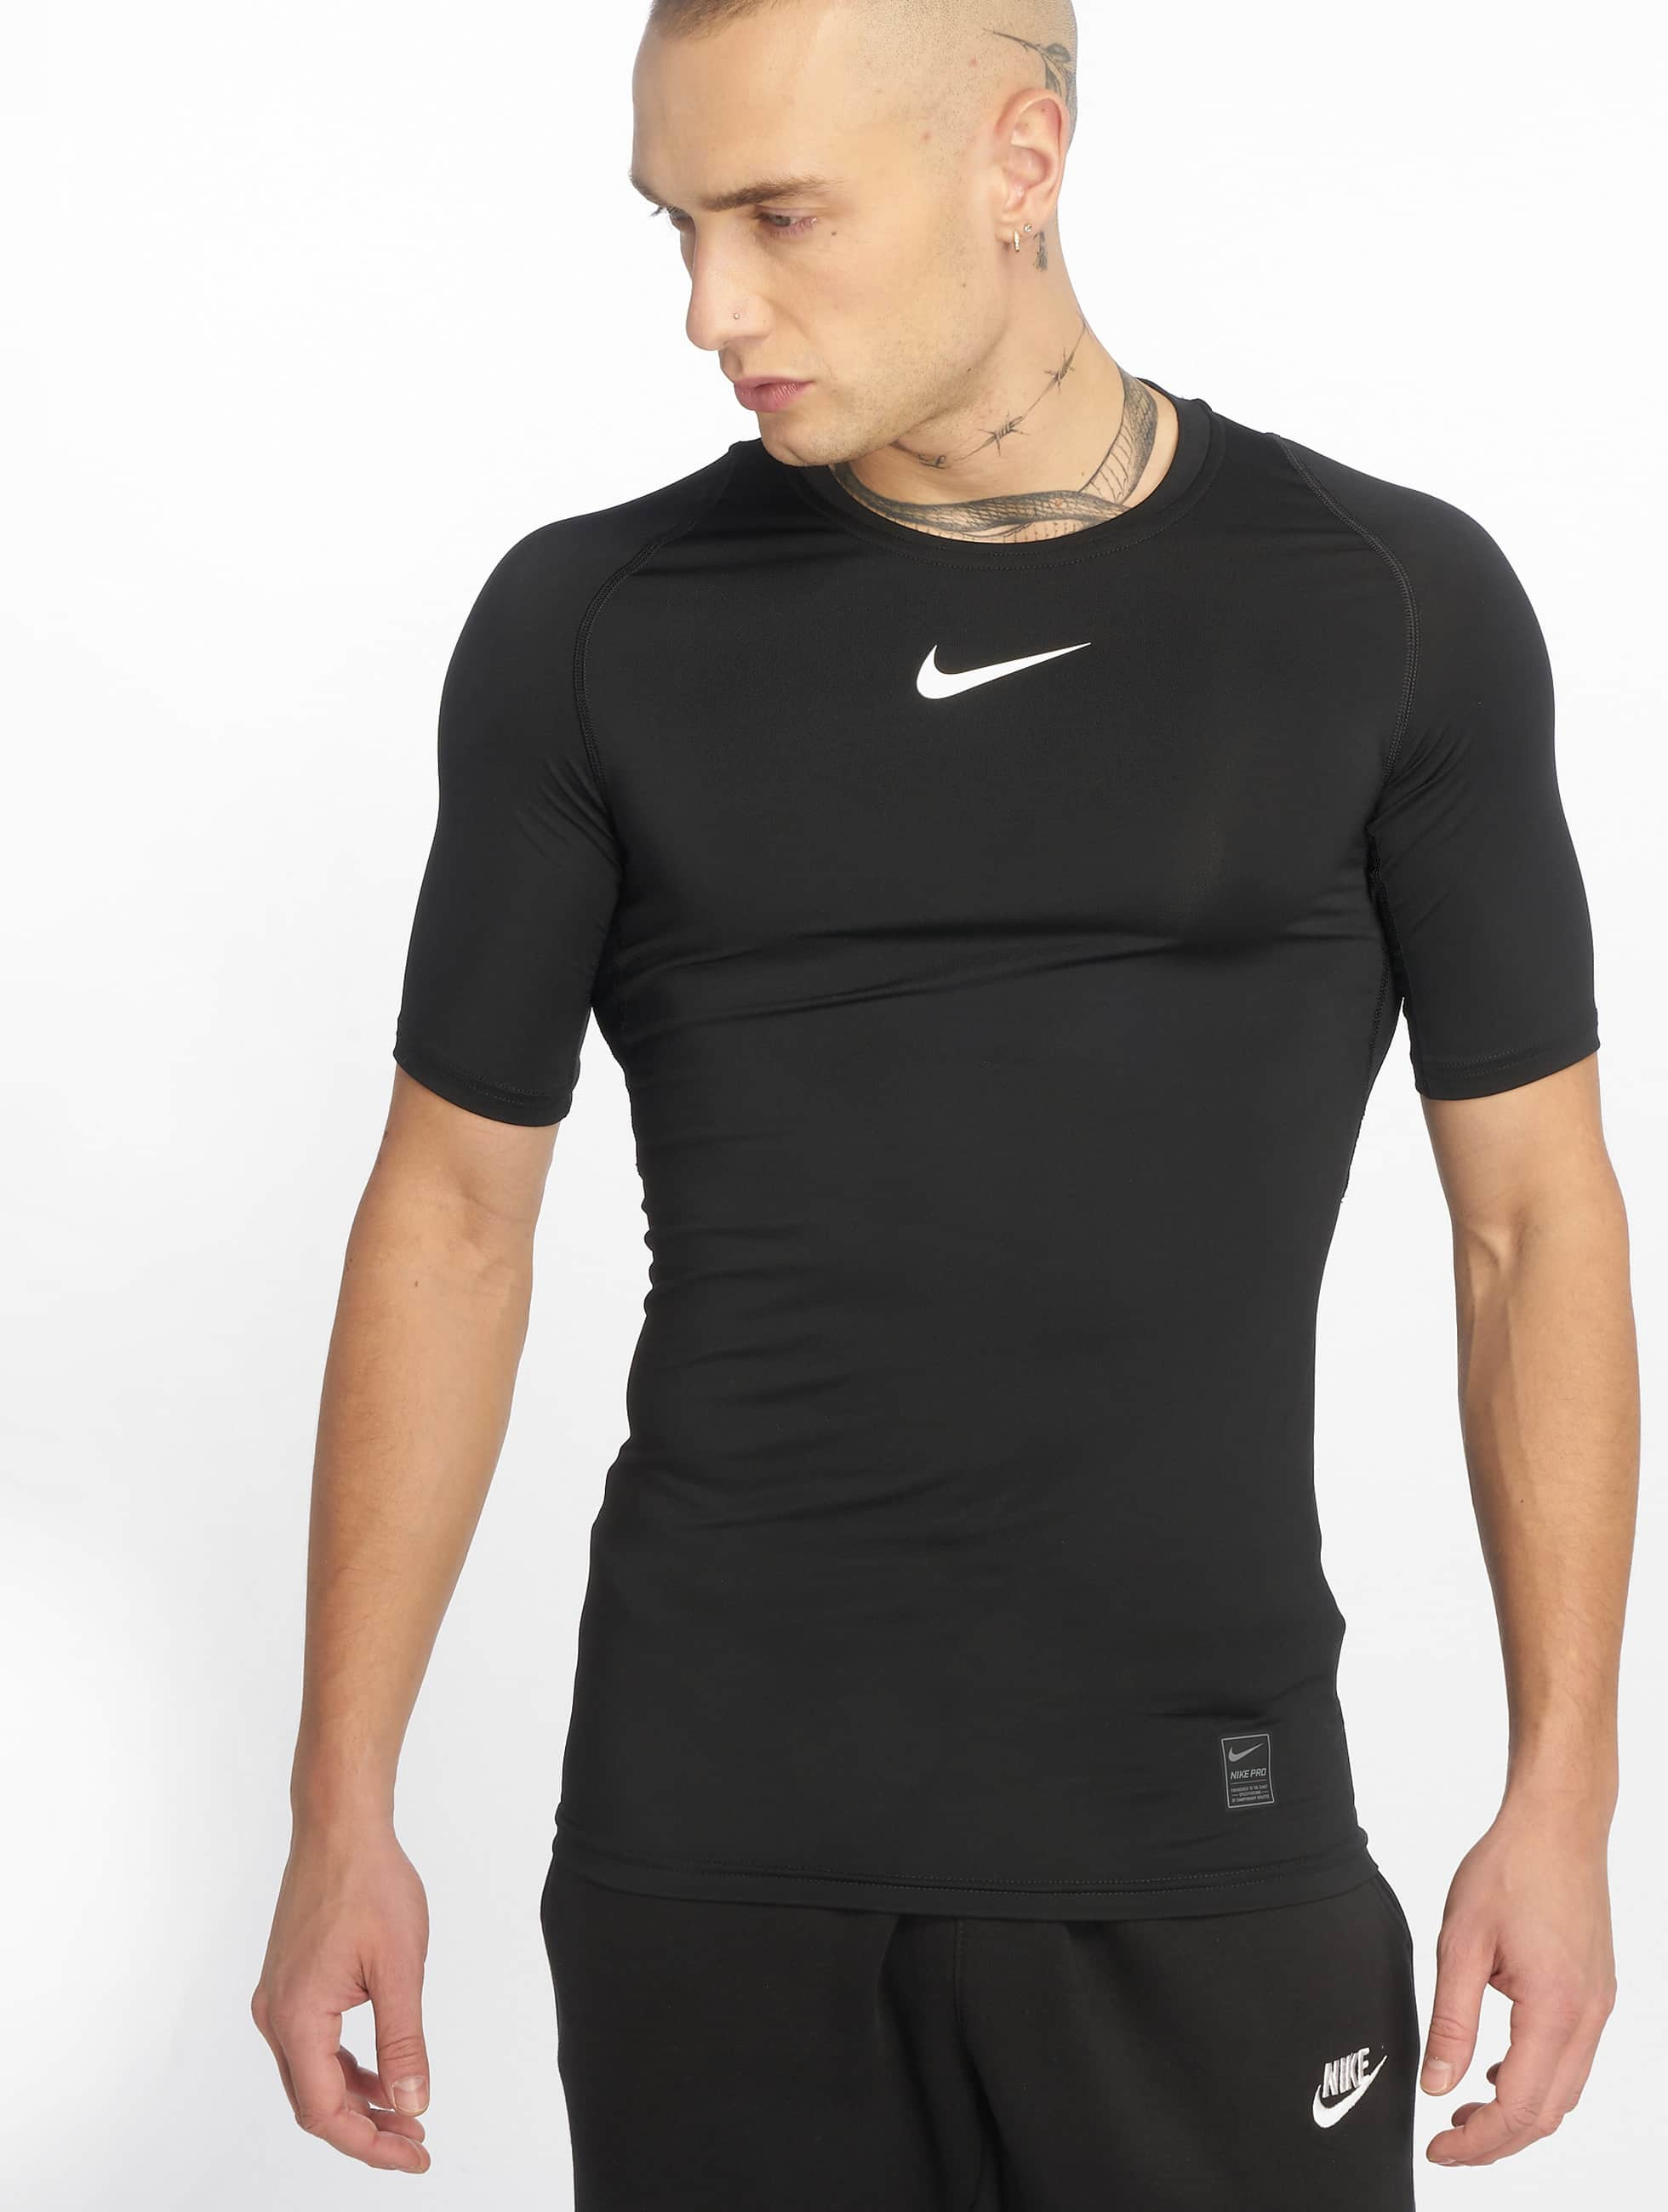 b05ca4fc1bf Nike Performance Sport / Compressie t-shirts Compressions in zwart 581937